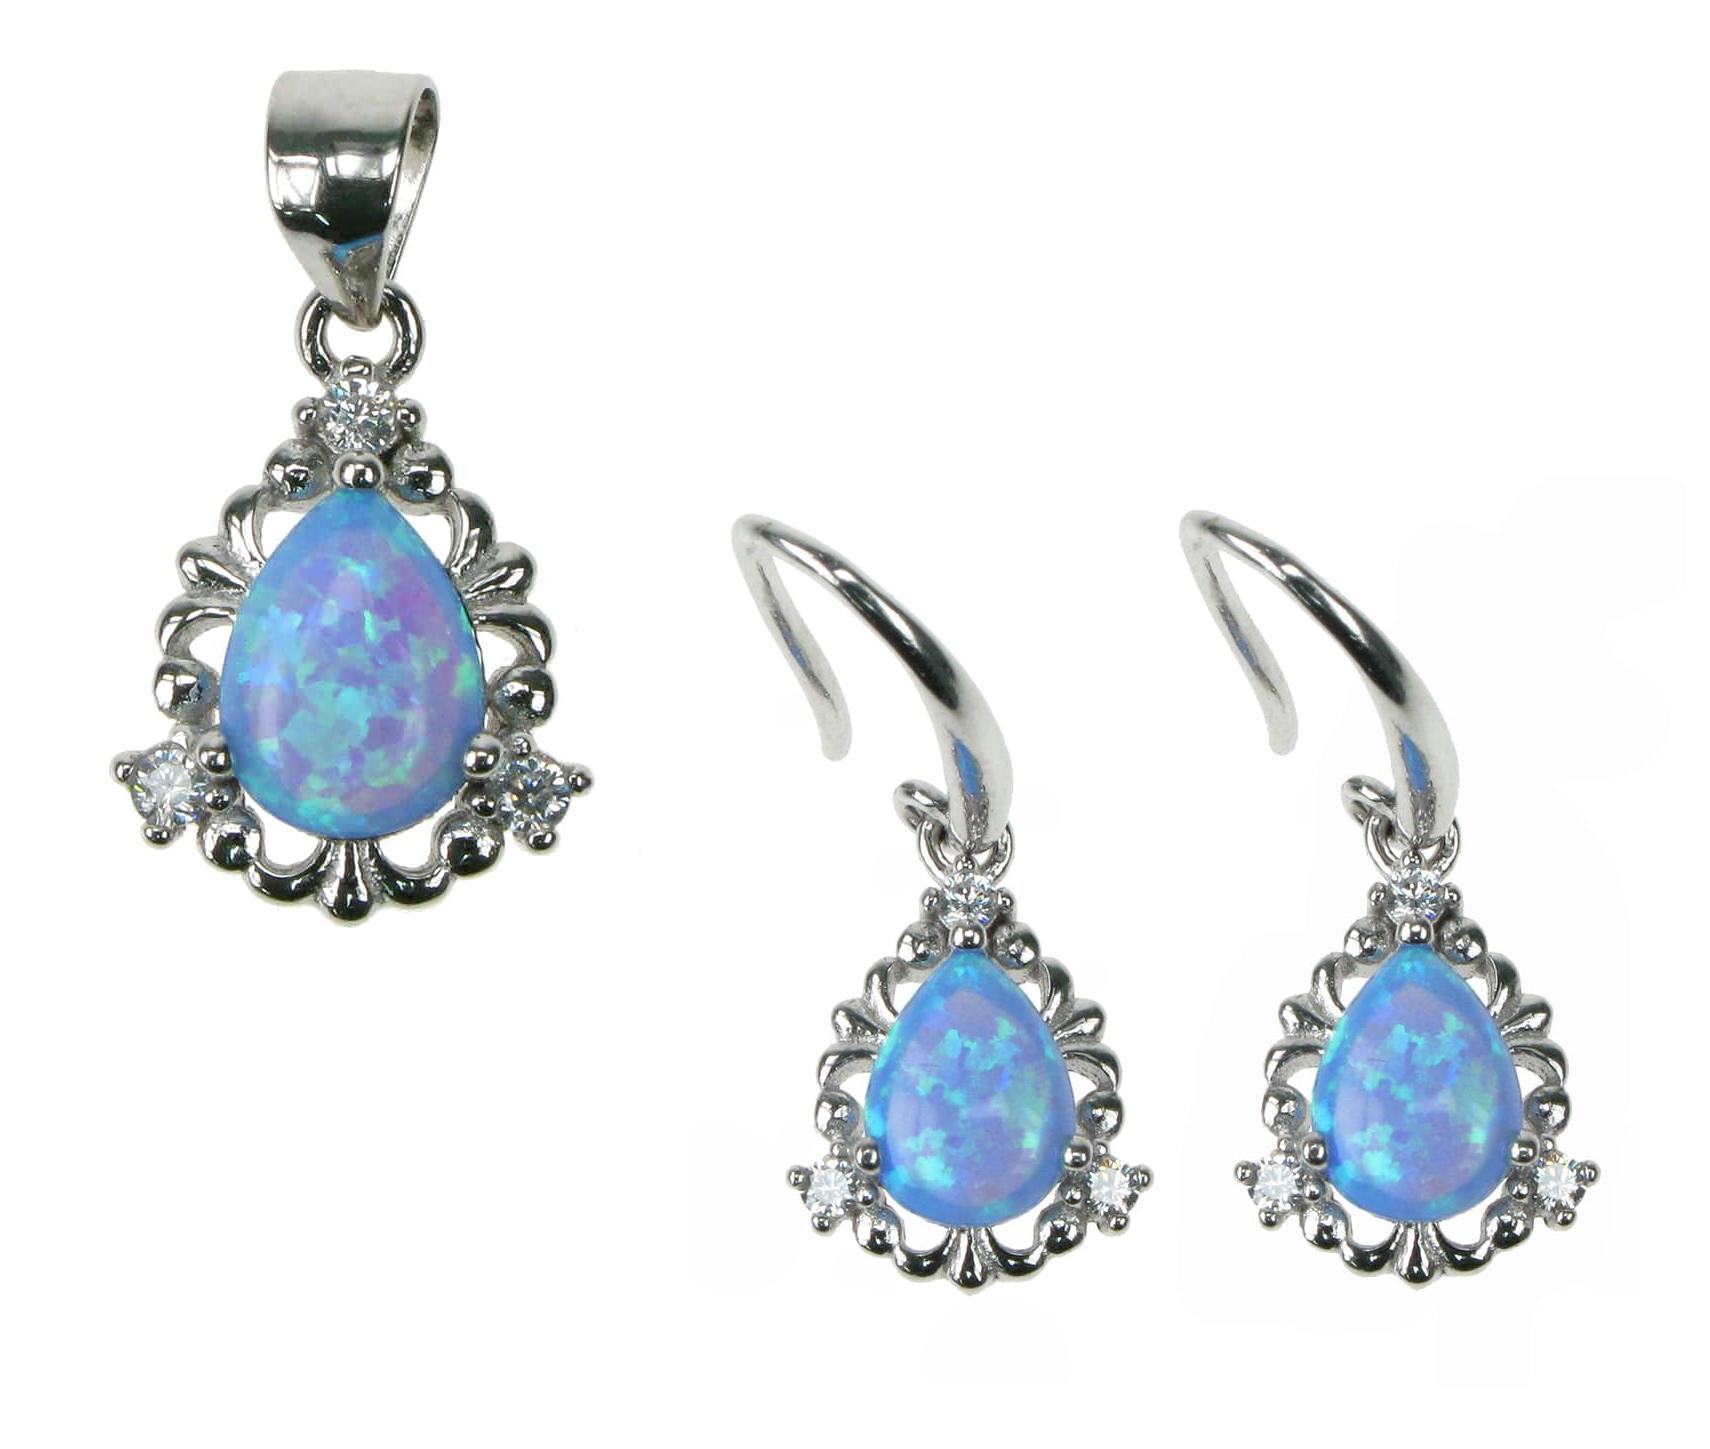 Dråbe blå opal smykkesæt med 925 Sterling sølv